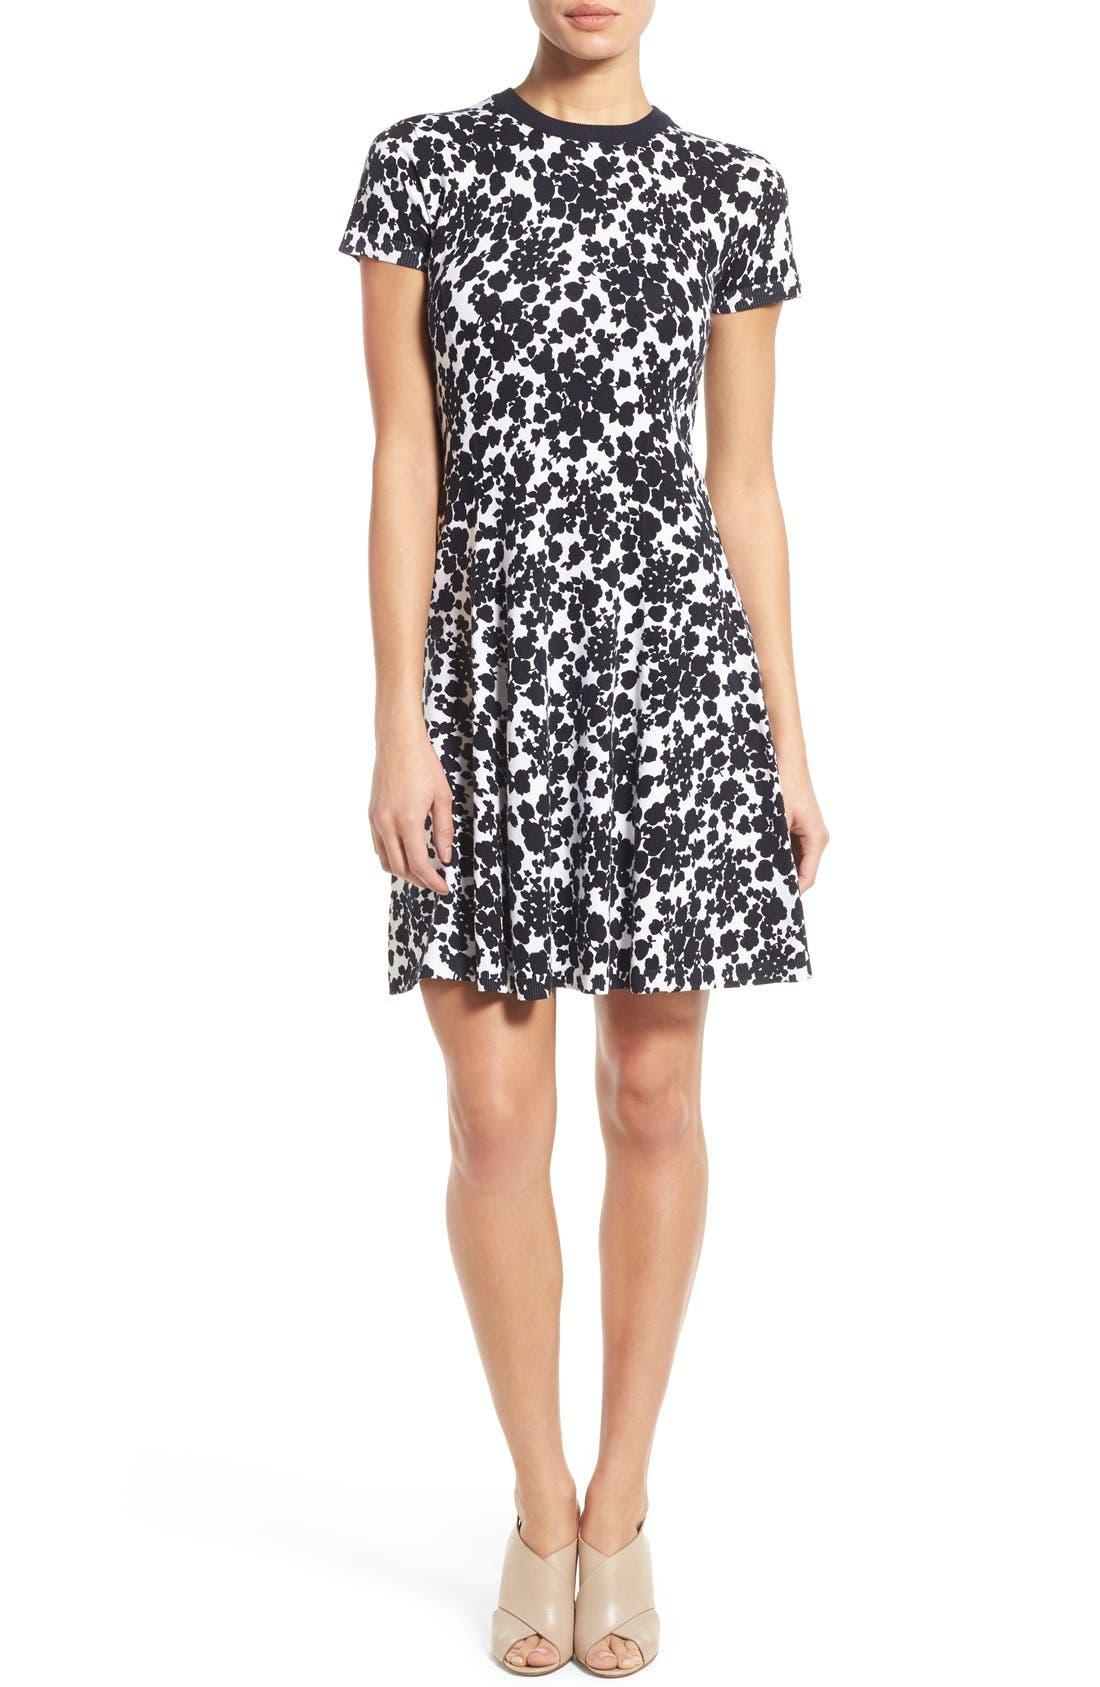 Alternate Image 1 Selected - MICHAEL Michael Kors 'Gemma' Print Fit & Flare Sweater Dress